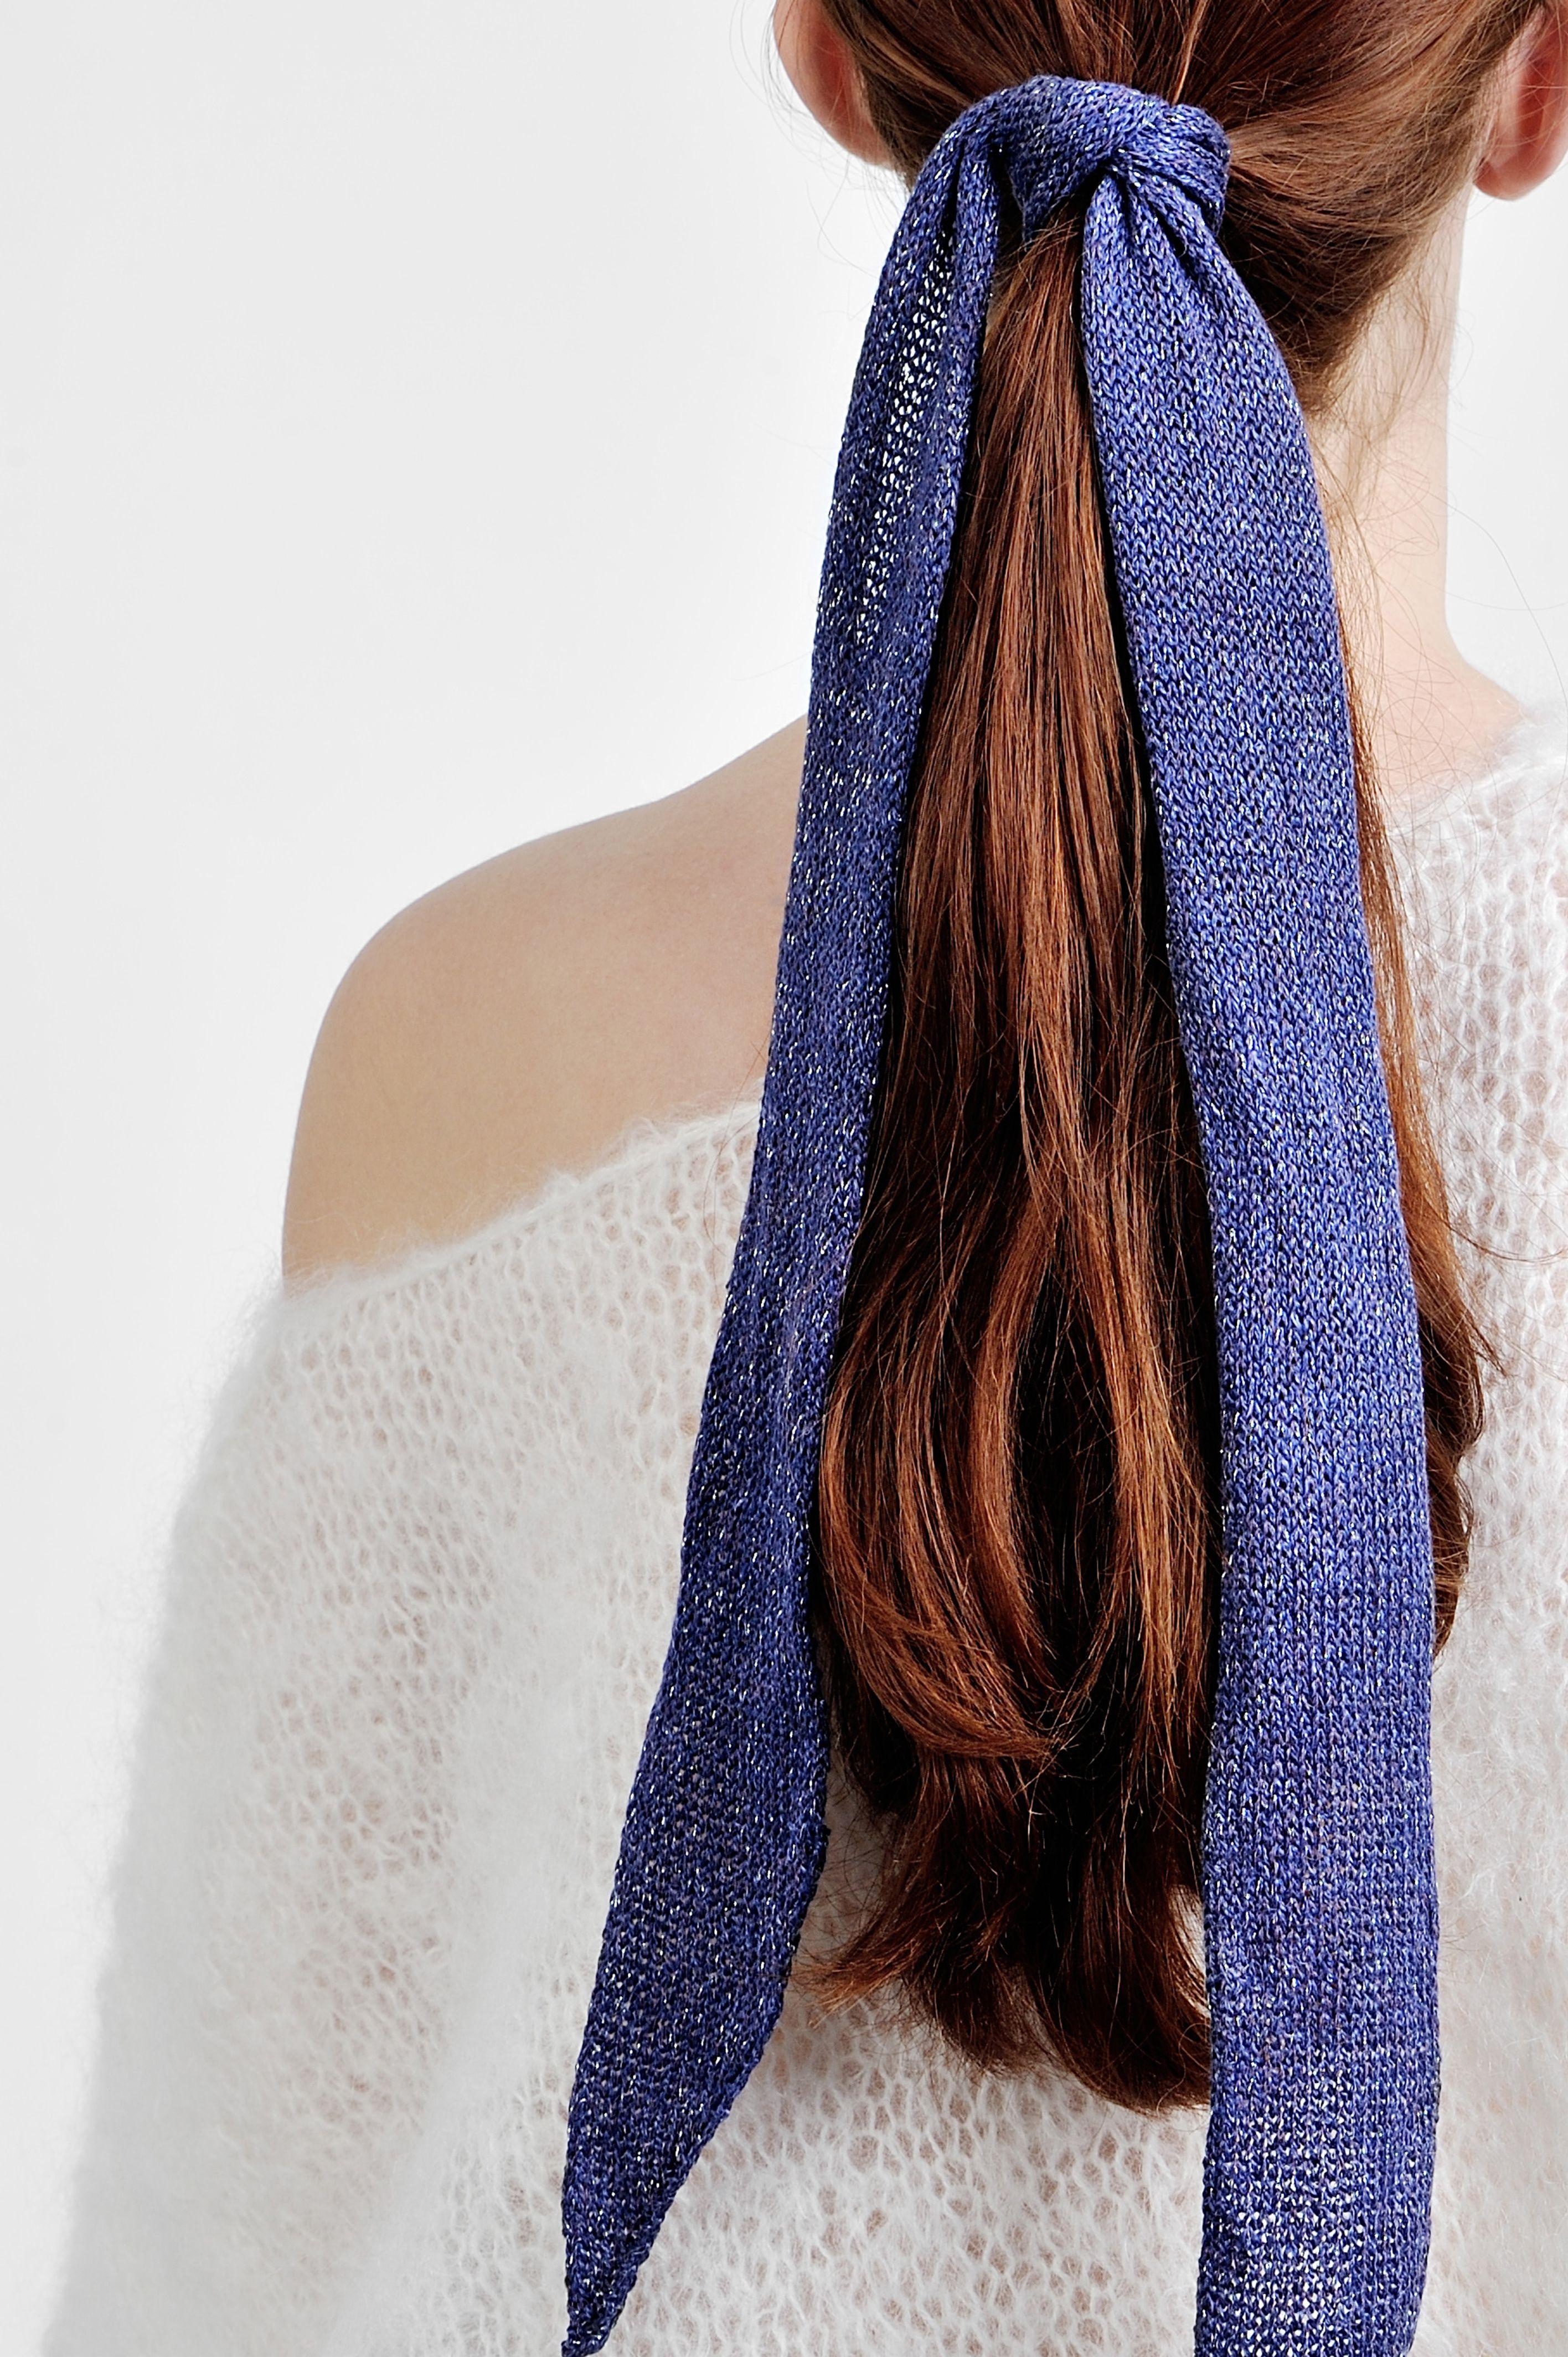 Bohemian head wrap braided adjustable headband knitted